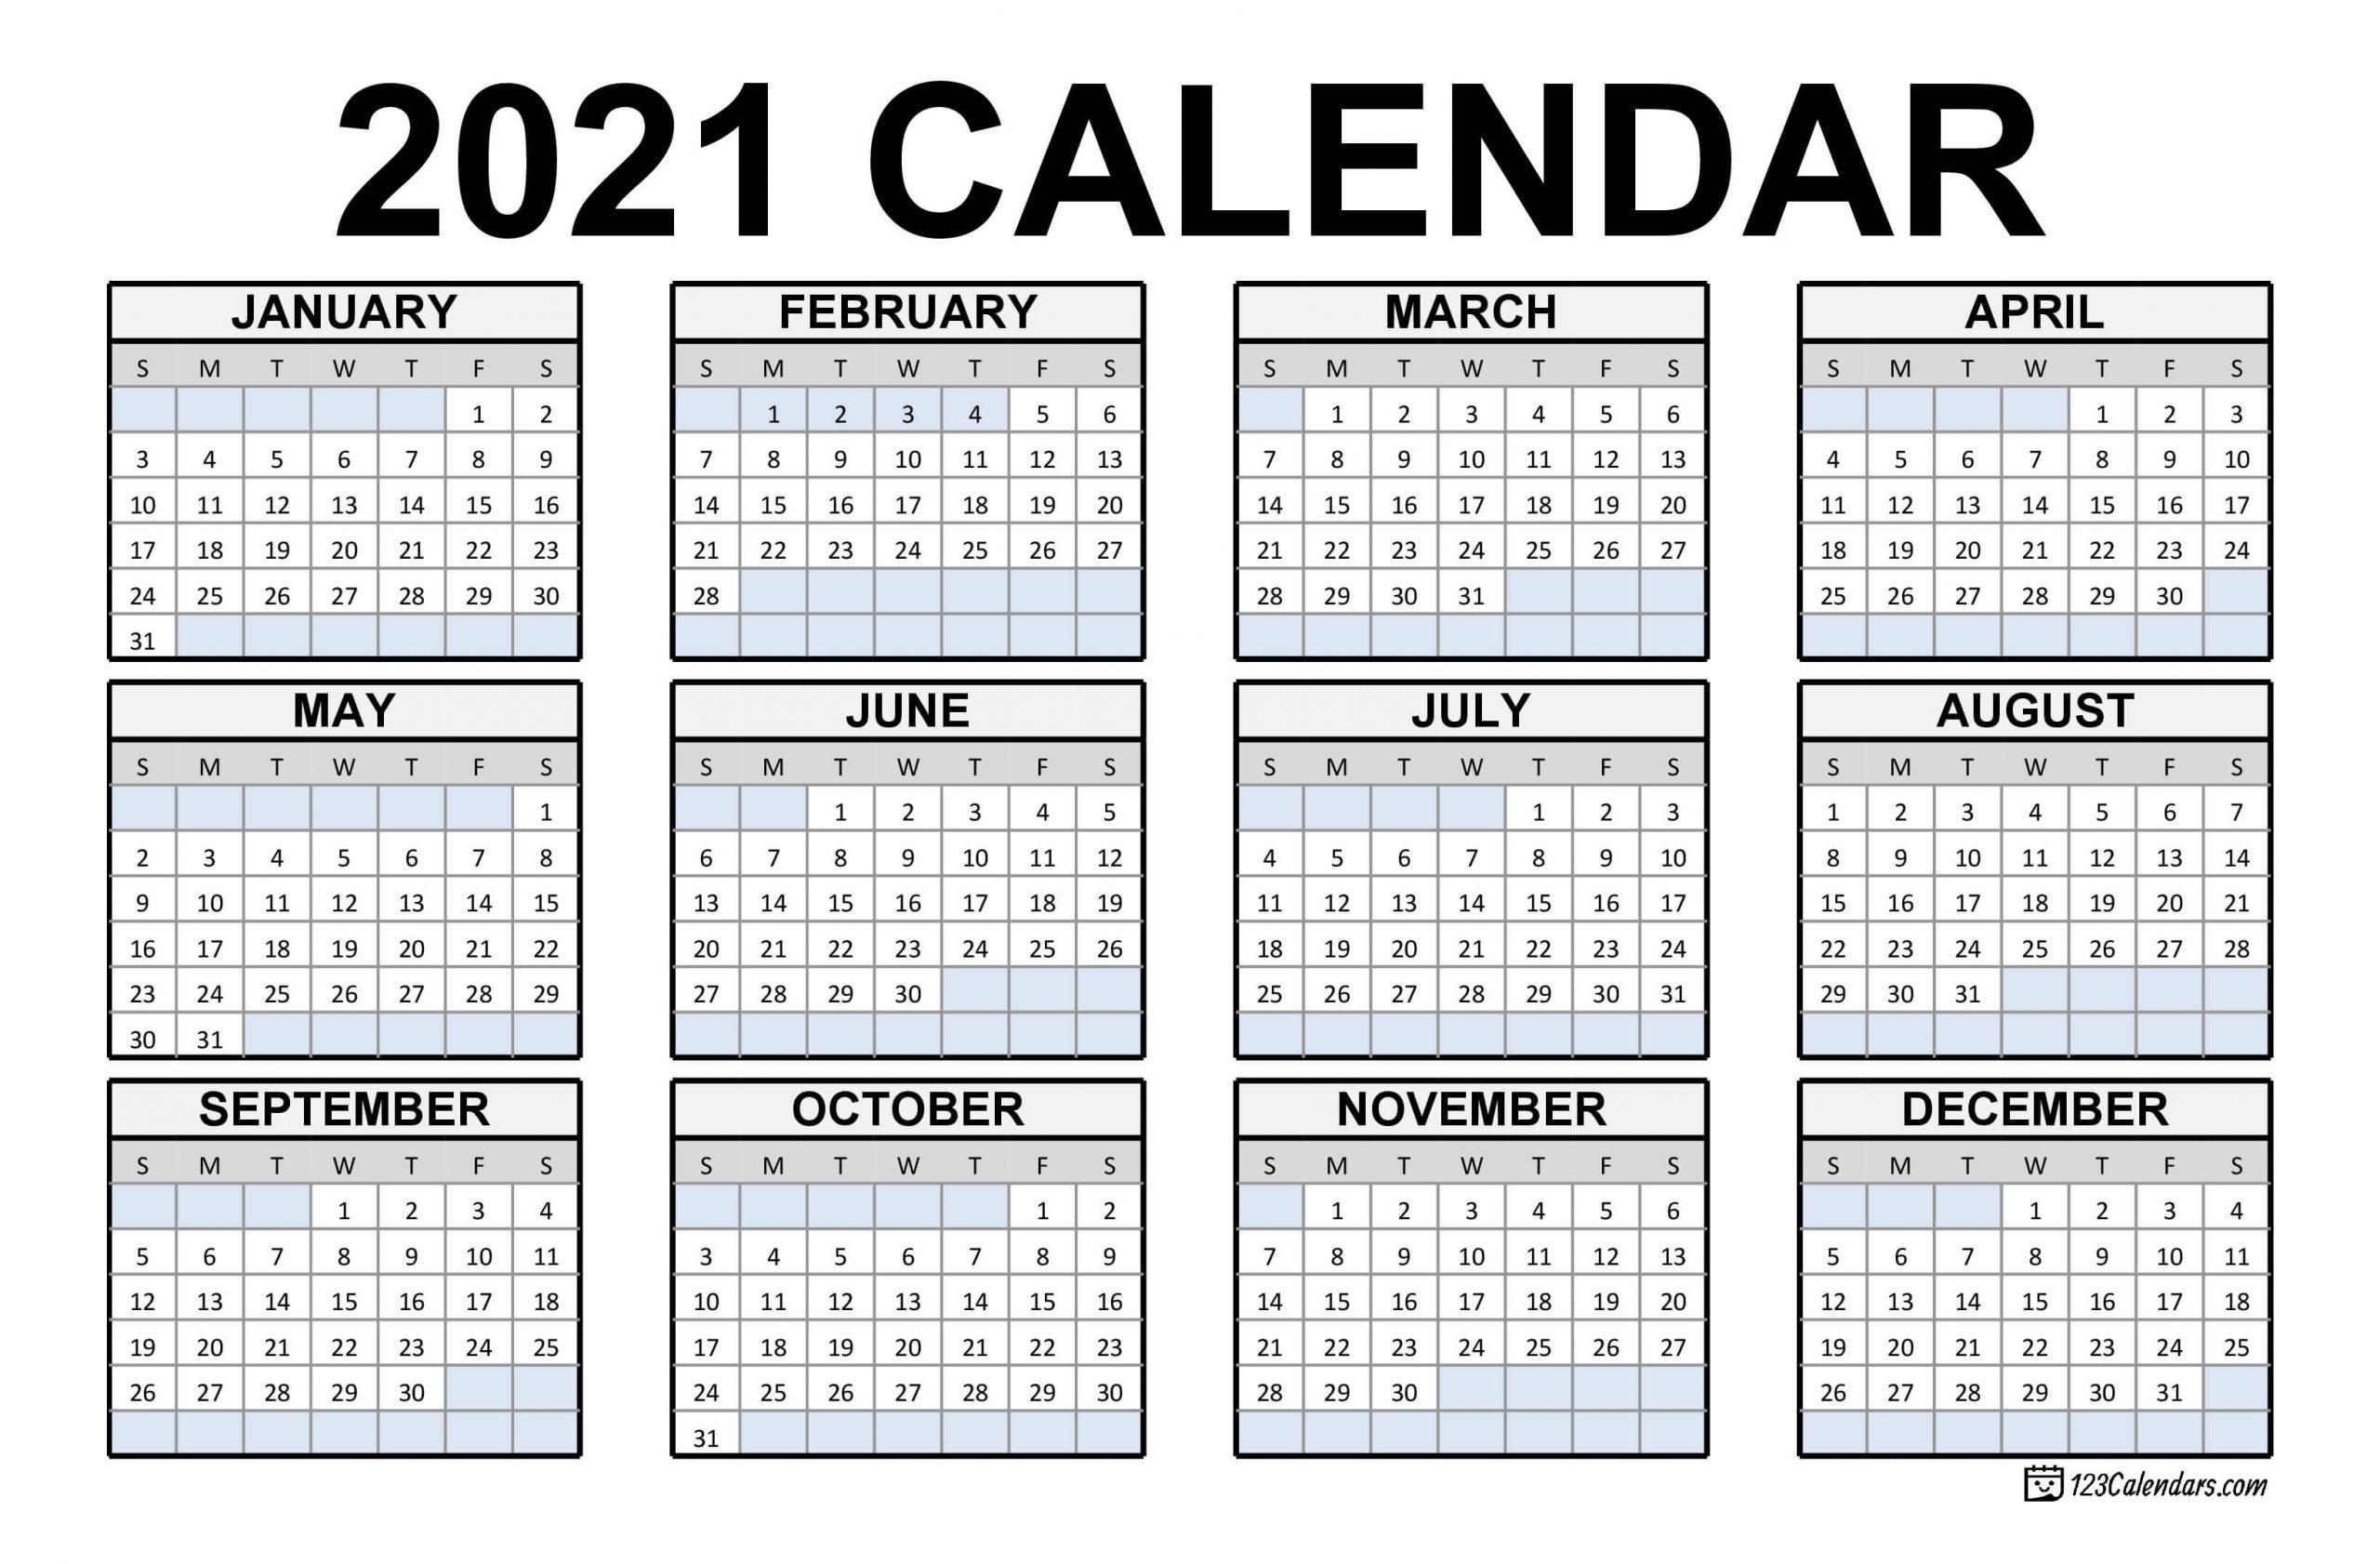 2021 Calendar Dates Print Off | Calendar Template Printable